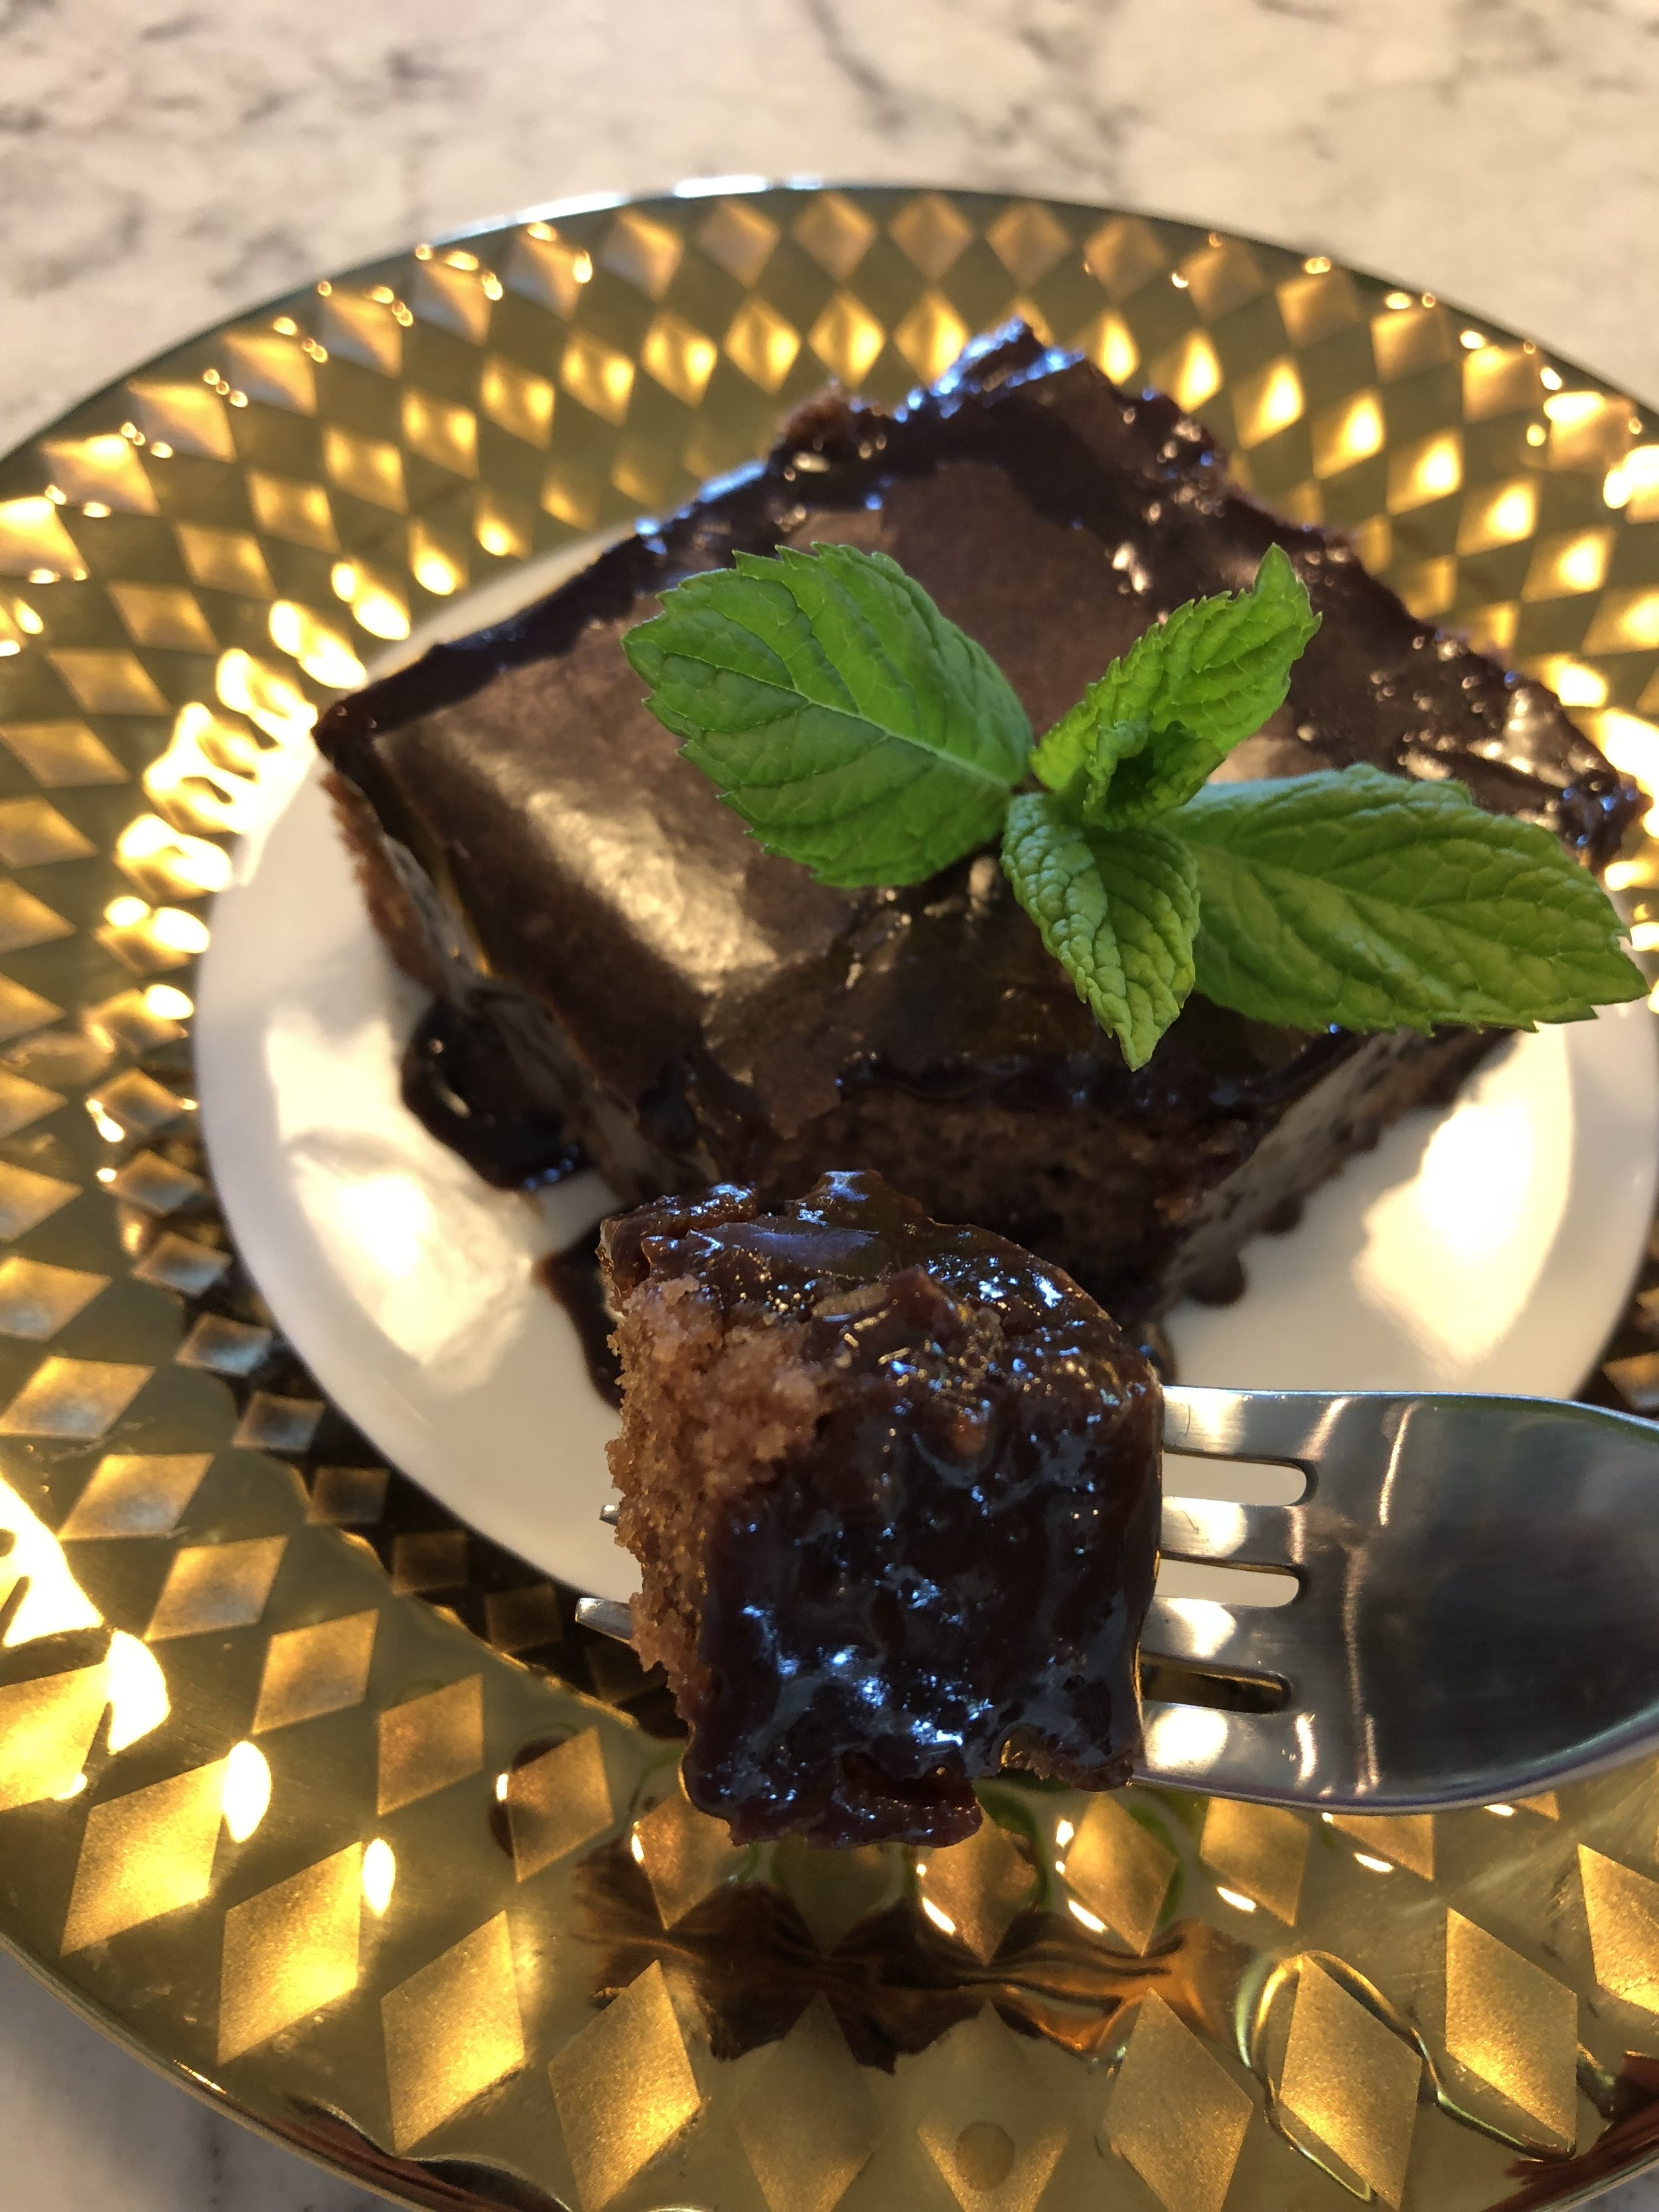 Texas Sheet Cake - yum